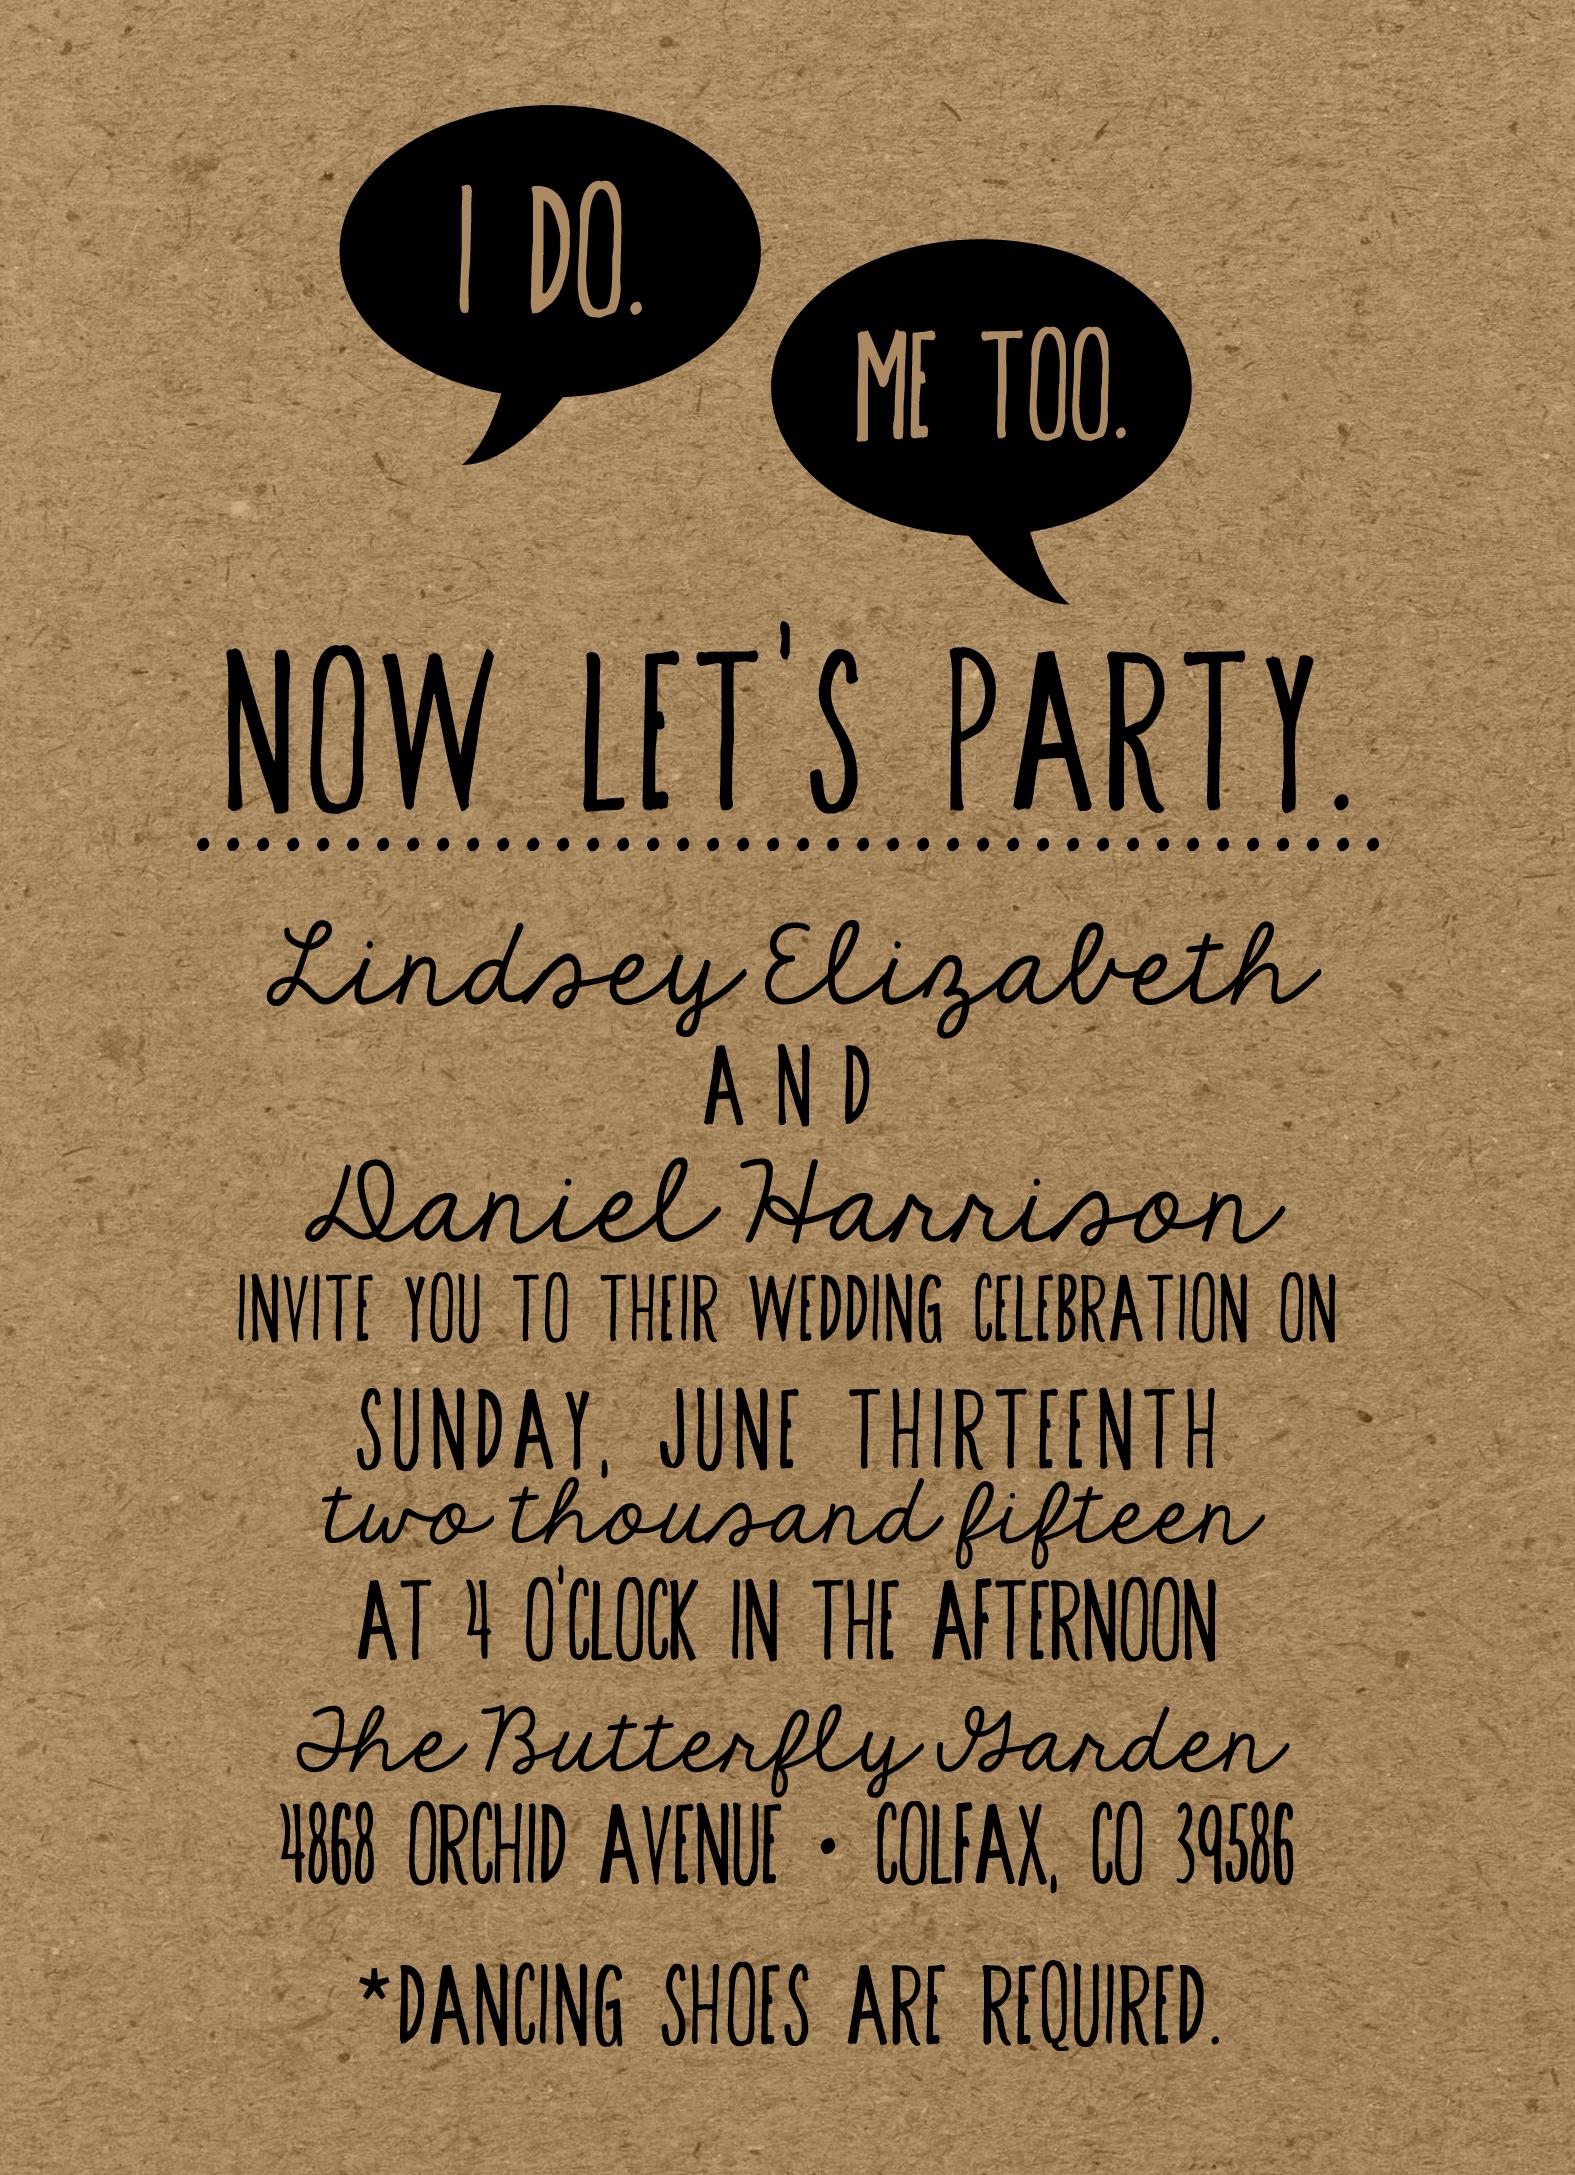 wedding invitation suites DIY Wedding Invitation Suite I Do Me Too DEPOSIT Printable Custom Quirky Kraft Paper Funny Hipster Invite Kit Digital Design 43